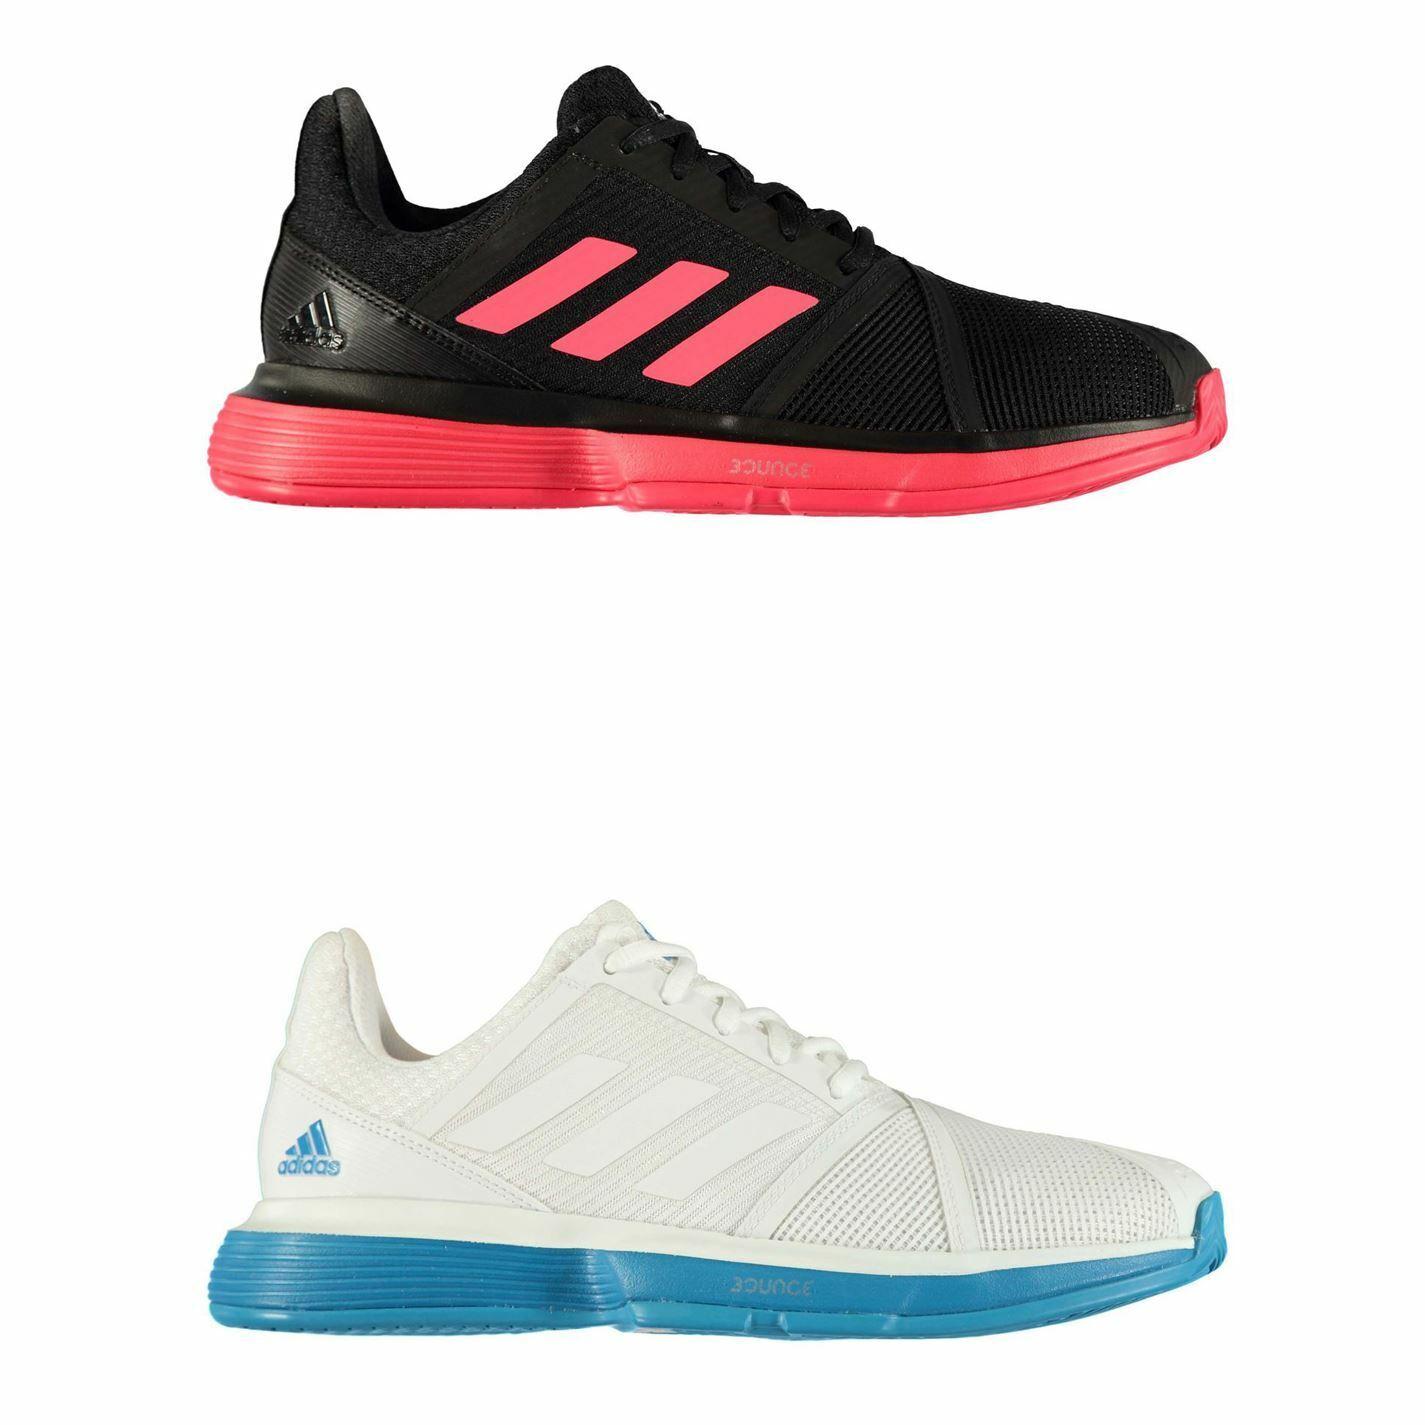 Adidas CourtJam Bounce Pour des hommes Tennis chaussures Trainers Sports Footwear paniers